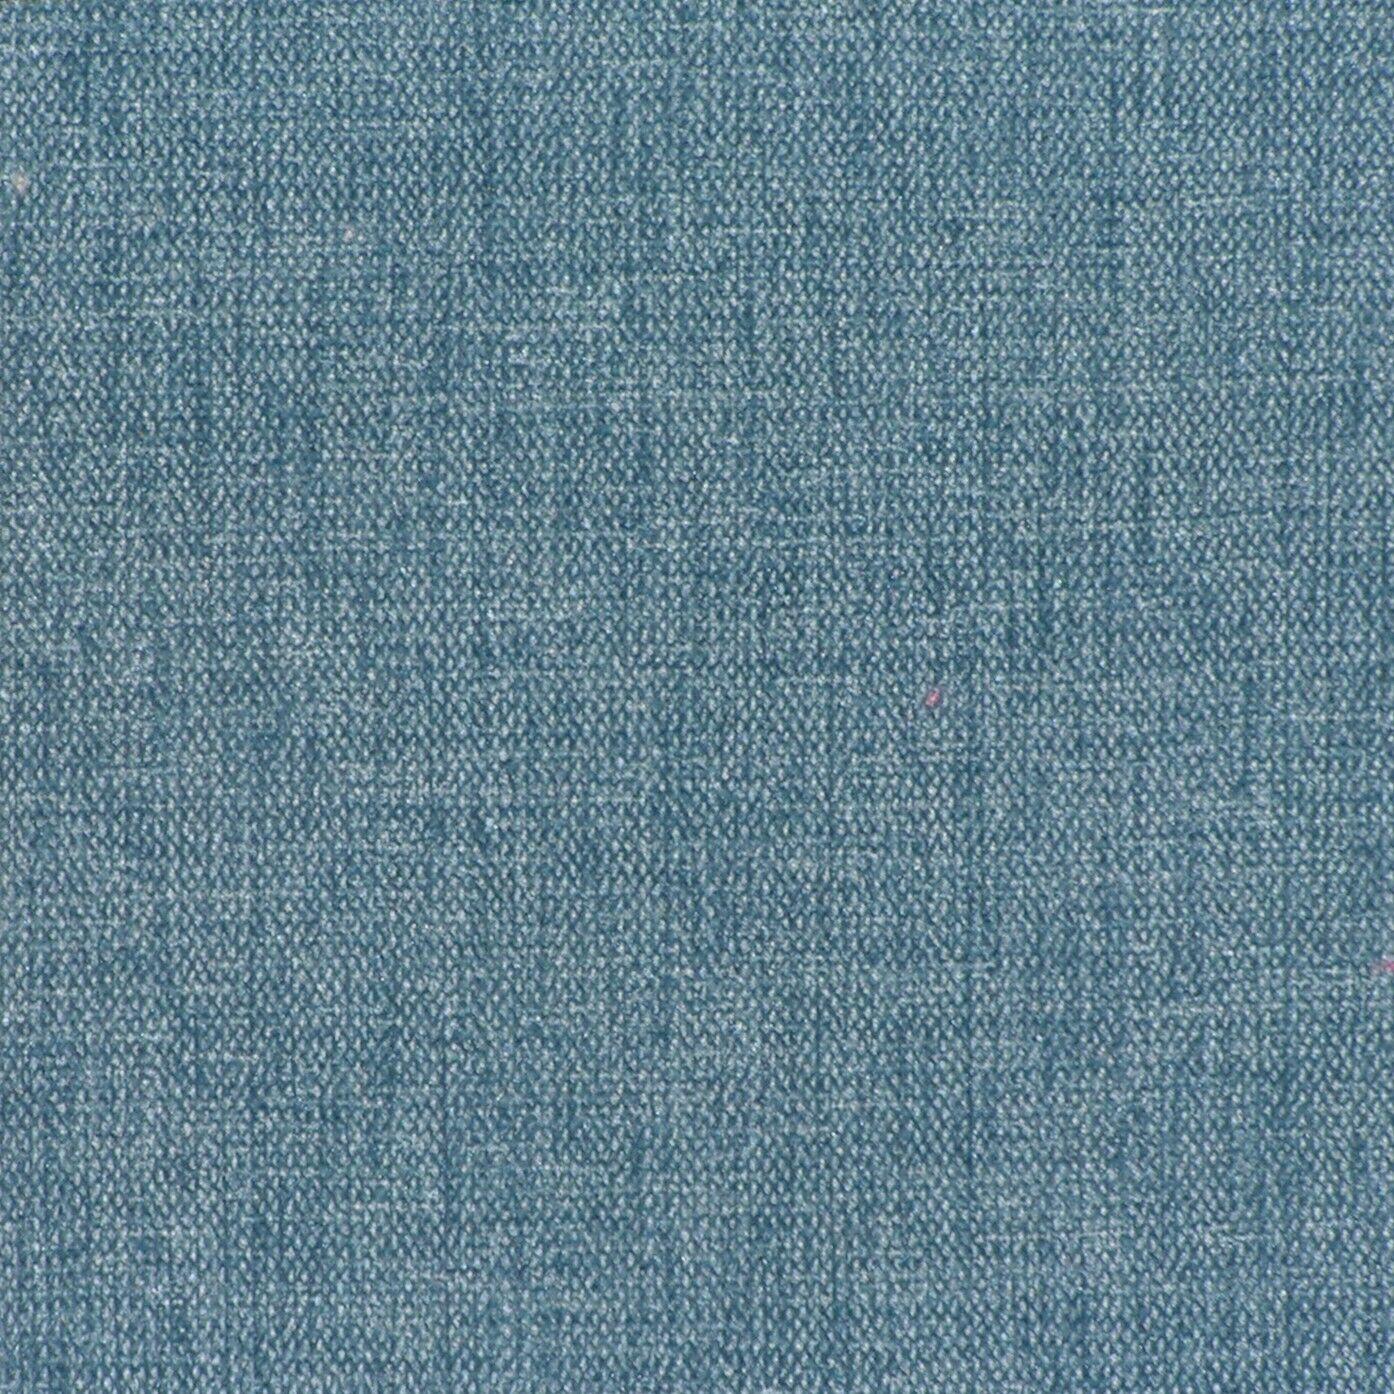 EvéneHommes t de textiles-Amalfi Noël